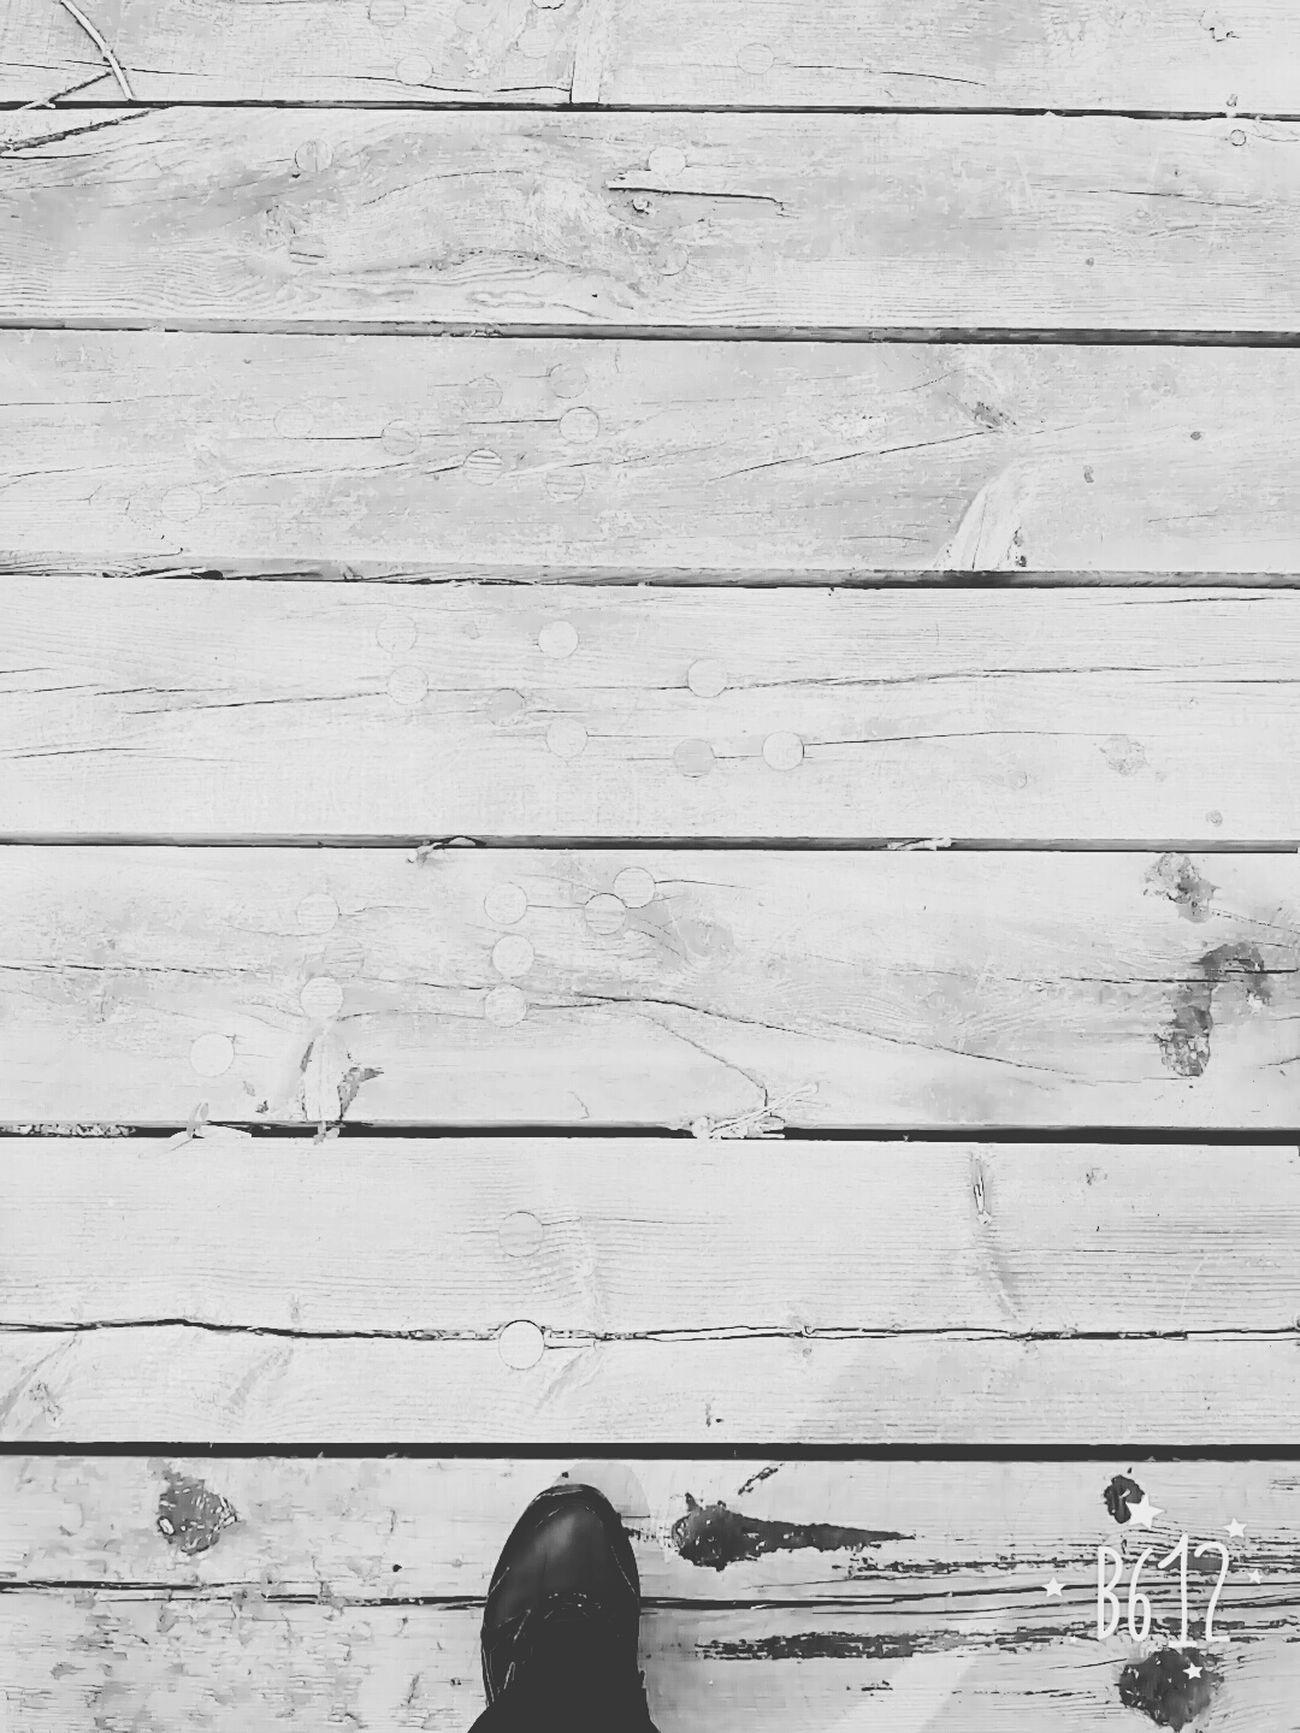 https://m.soundcloud.com/georgiamusic-1/hoizer-take-me-to-church 🎶🎵🎼🎹🎸🎤🎧 Hoizer TakeMeToChurch Listening Music Enjoying Life Happiness ♡ Eyeemphotography Blackandwhite Eye4blackandwhite EyeEmBlackAndWhite Loneliness